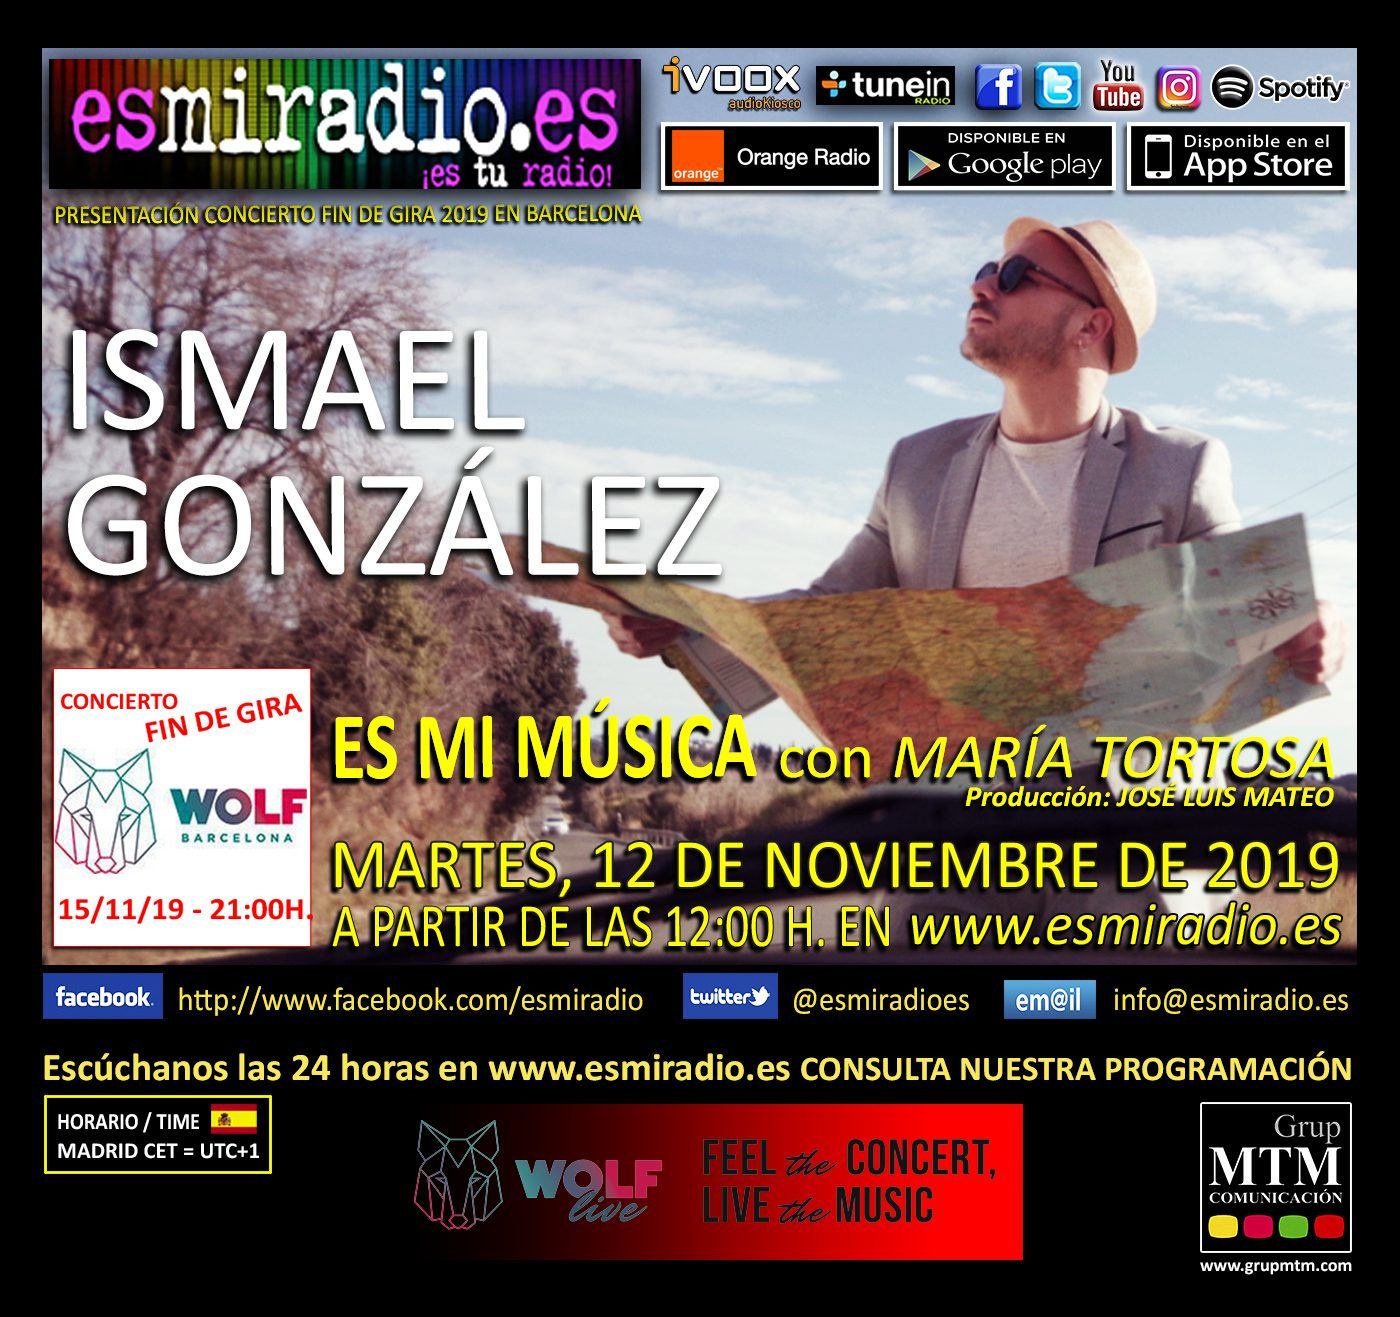 Ismael González esmiradio